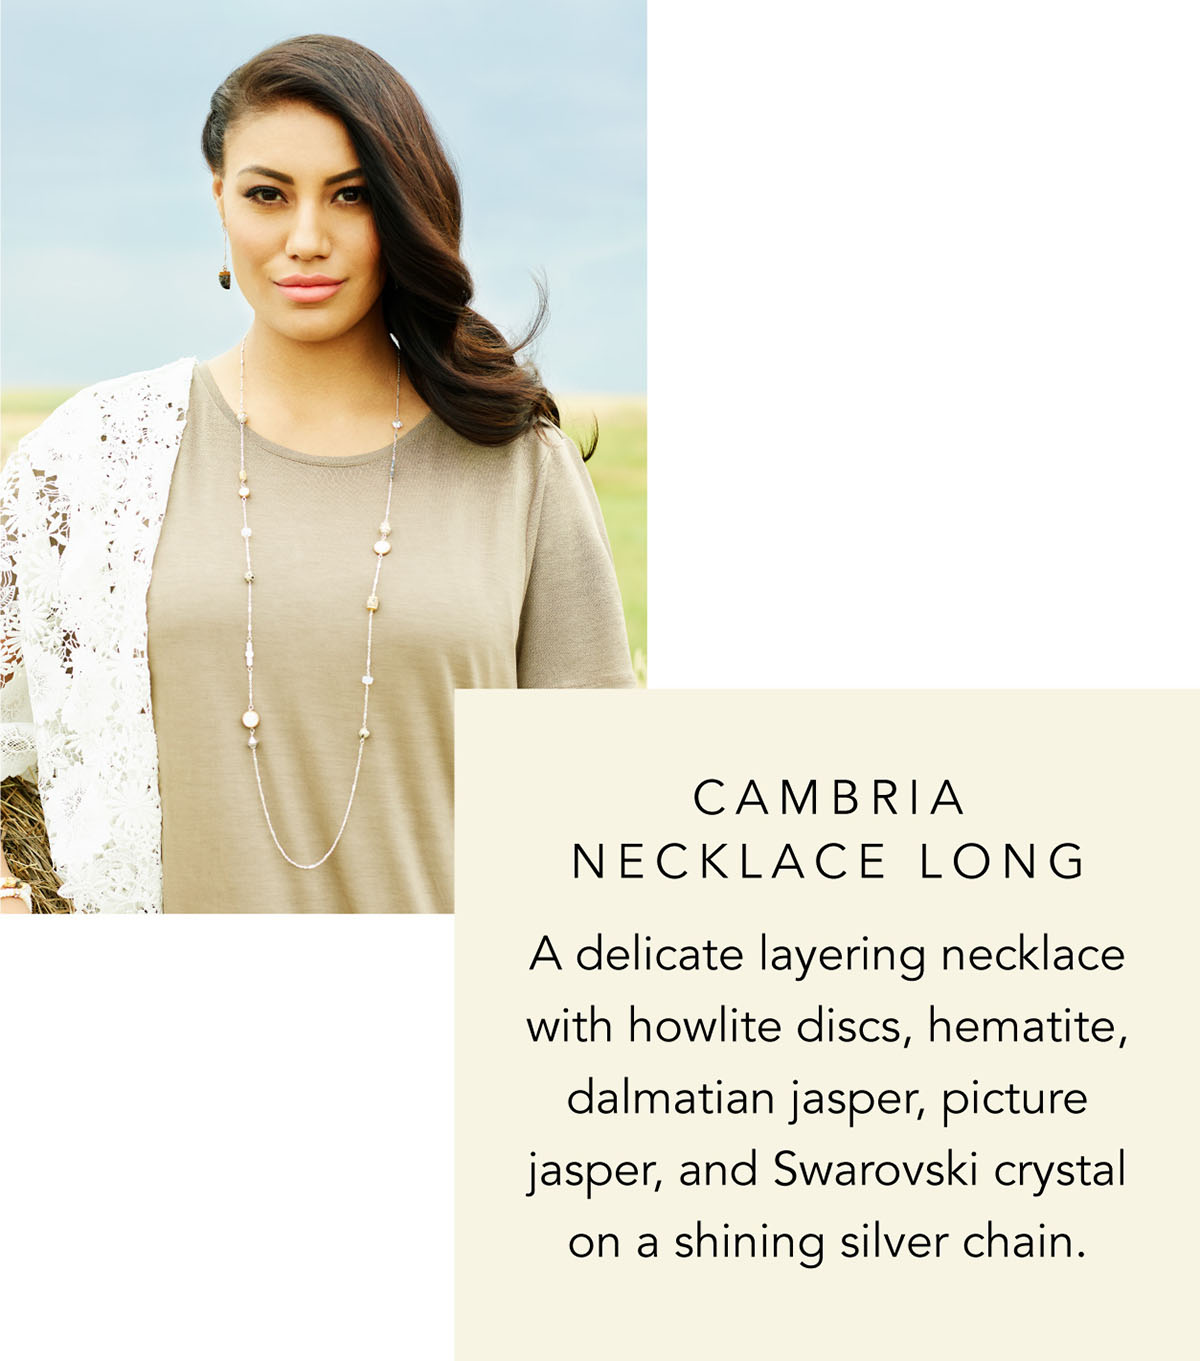 Cambria Necklace Long